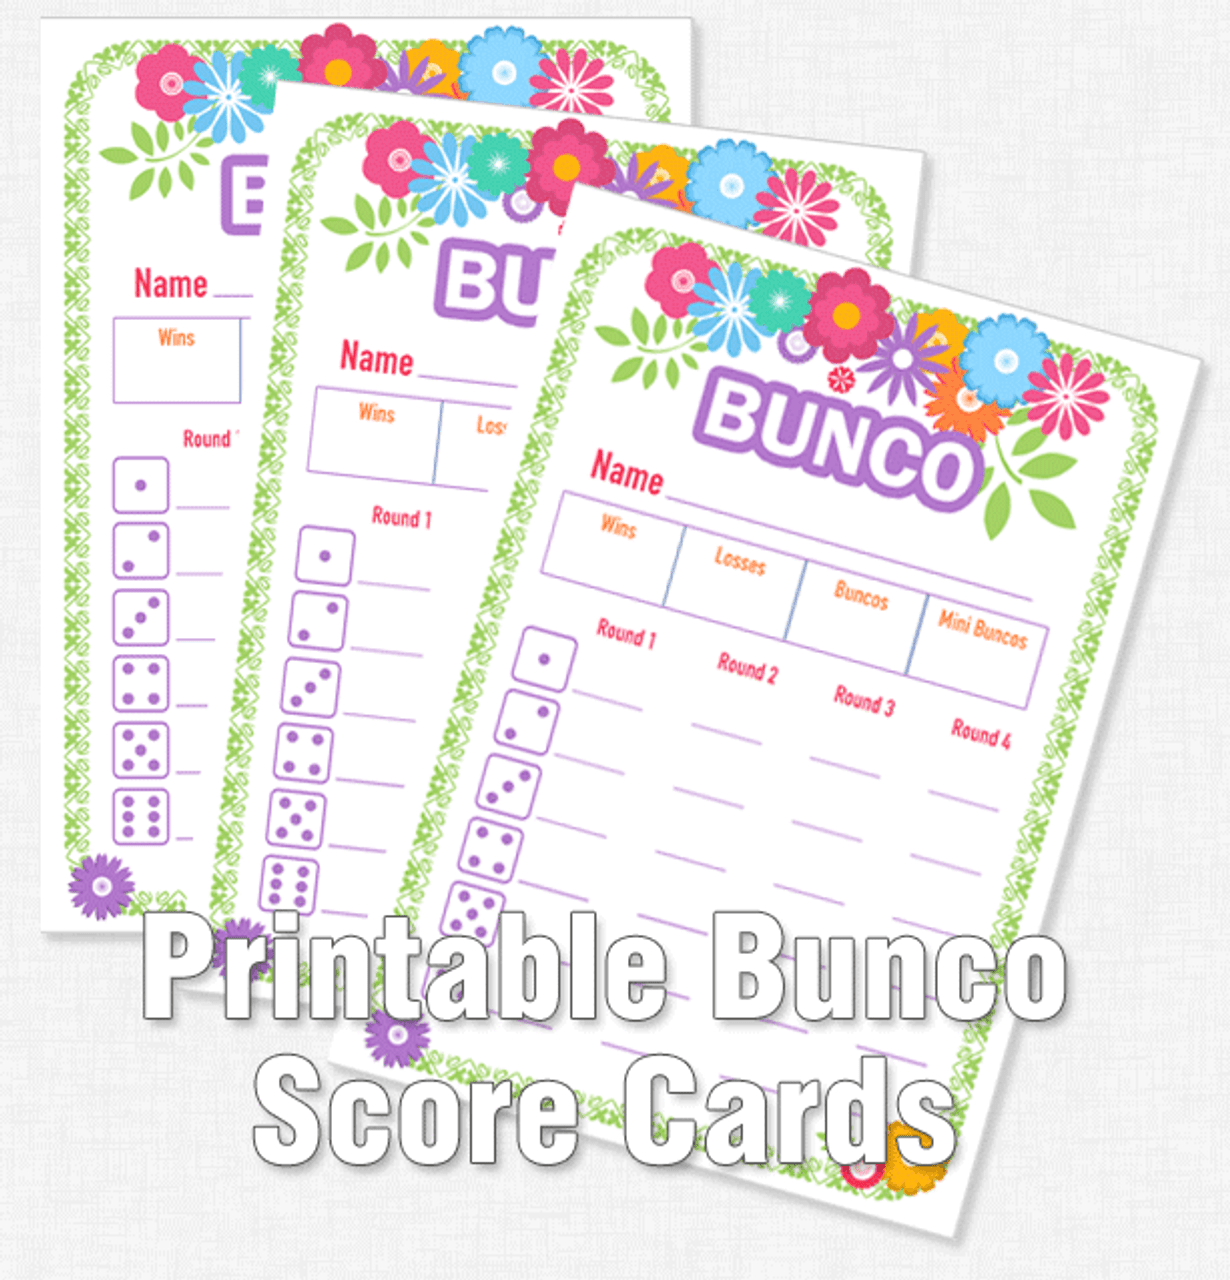 printable flower bunco score cards dice game depot